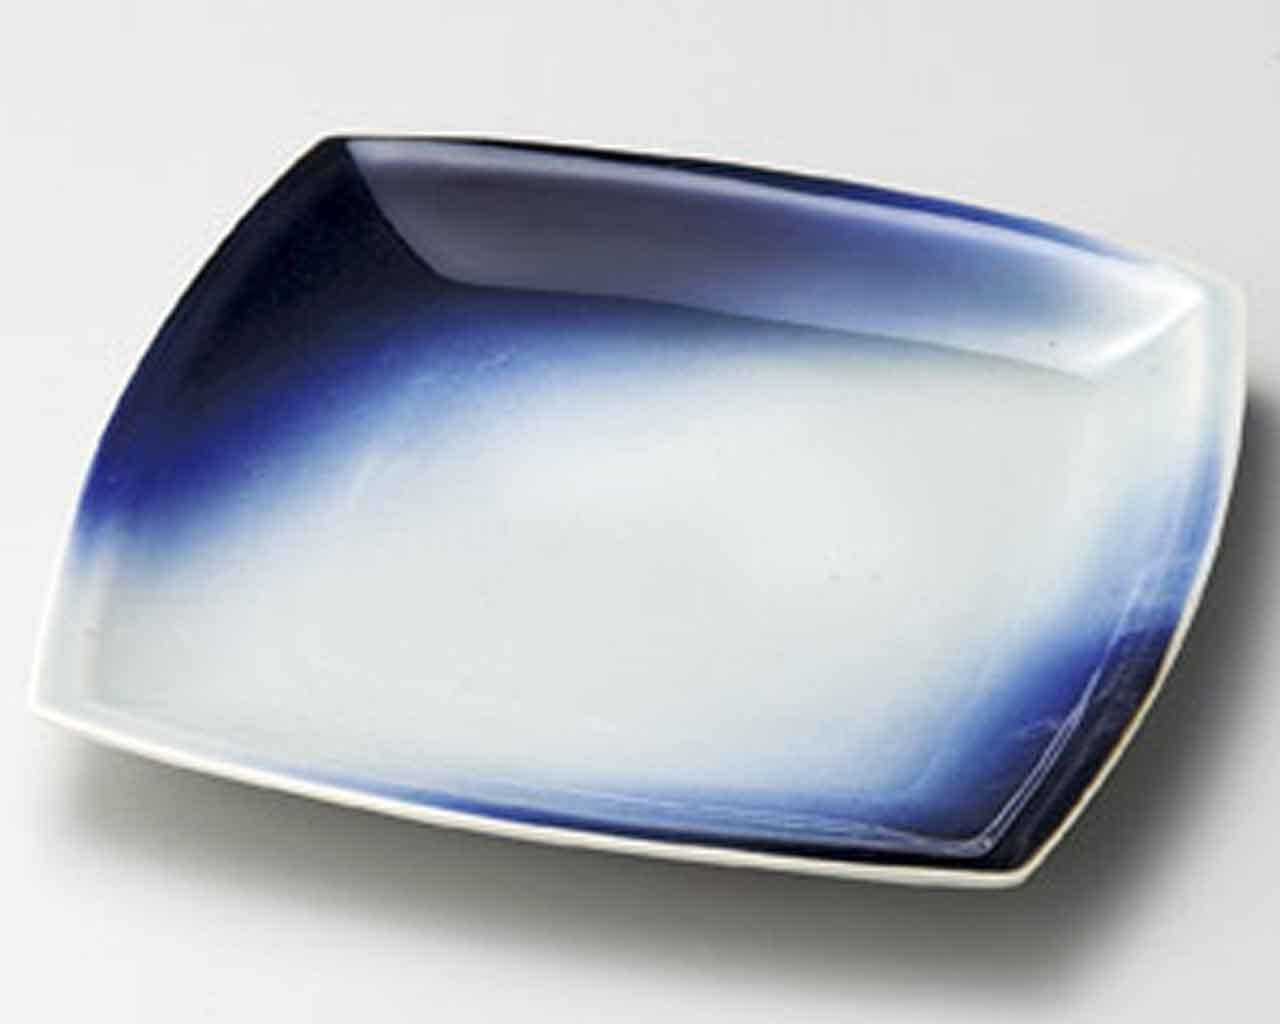 Aozora Blue Sky 8.8inch Set of 5 Medium Plates White Ceramic Made in Japan